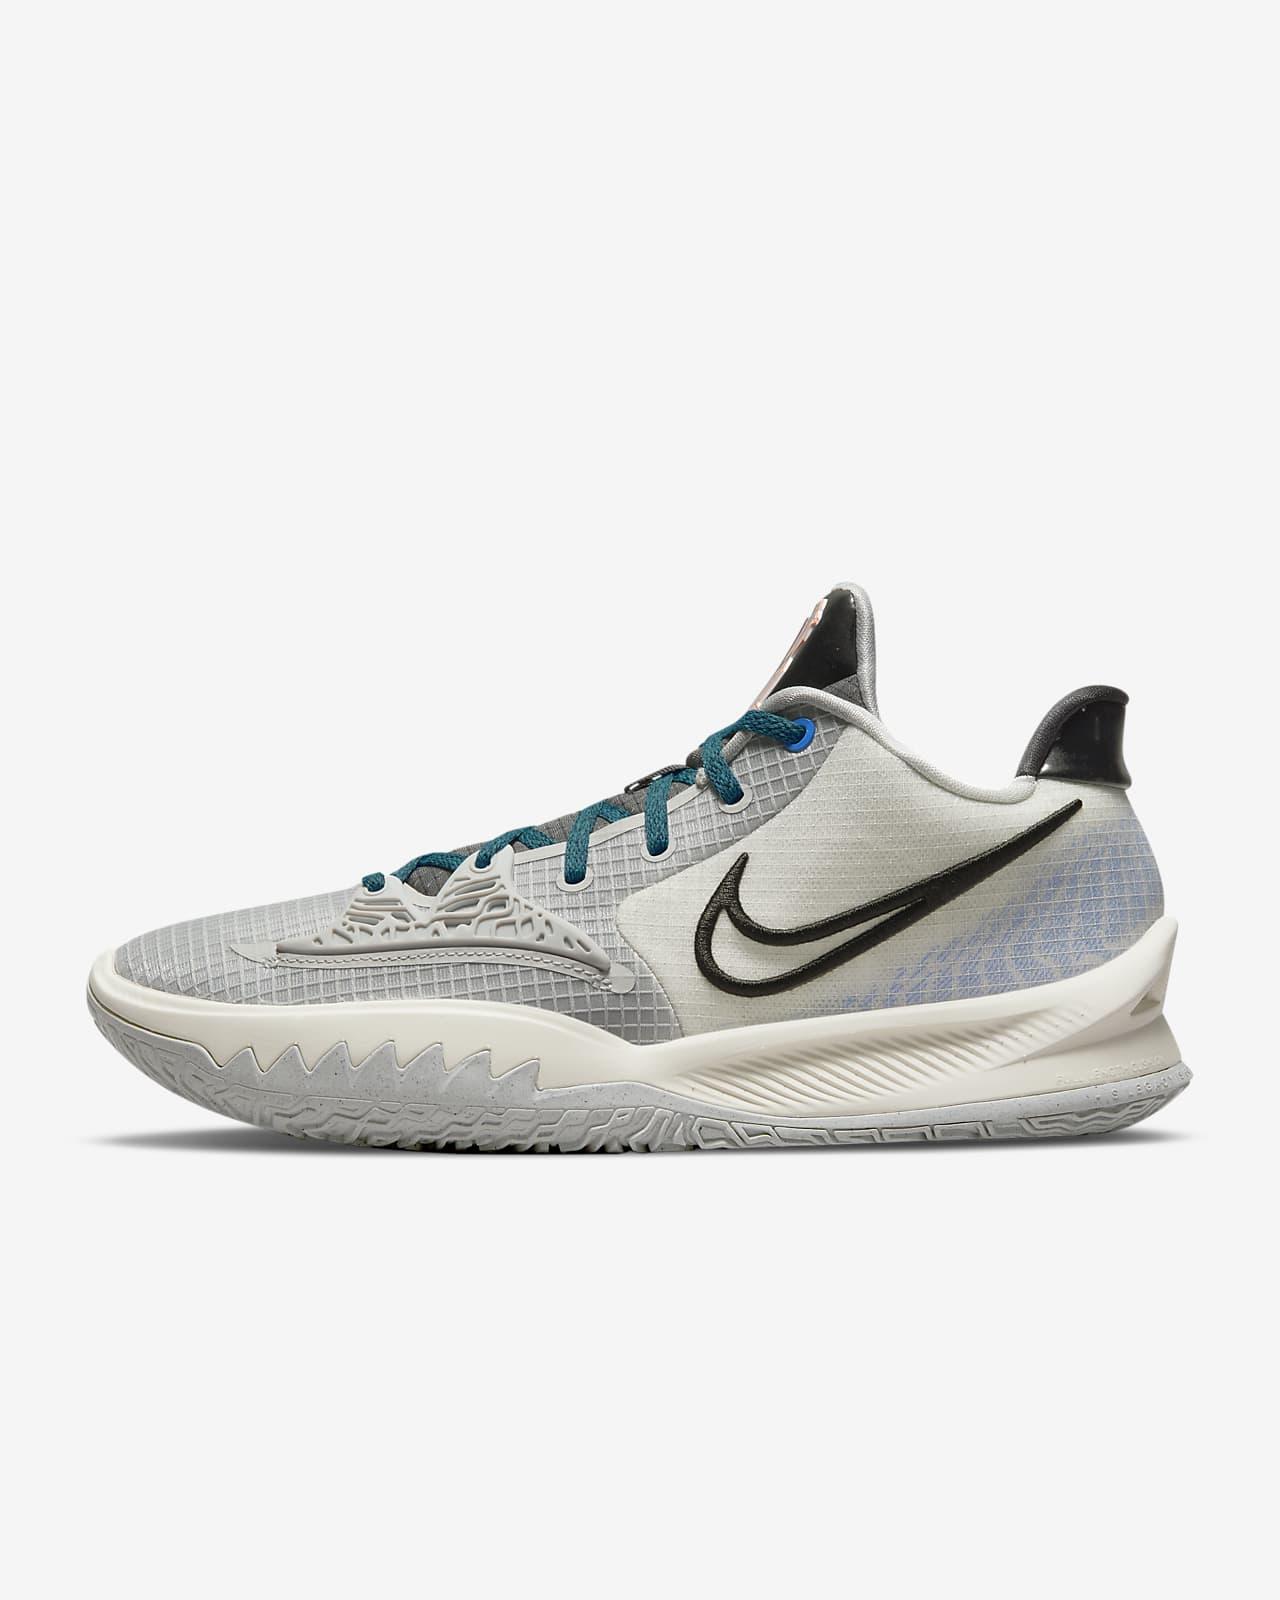 Chaussure de basketball Kyrie Low4